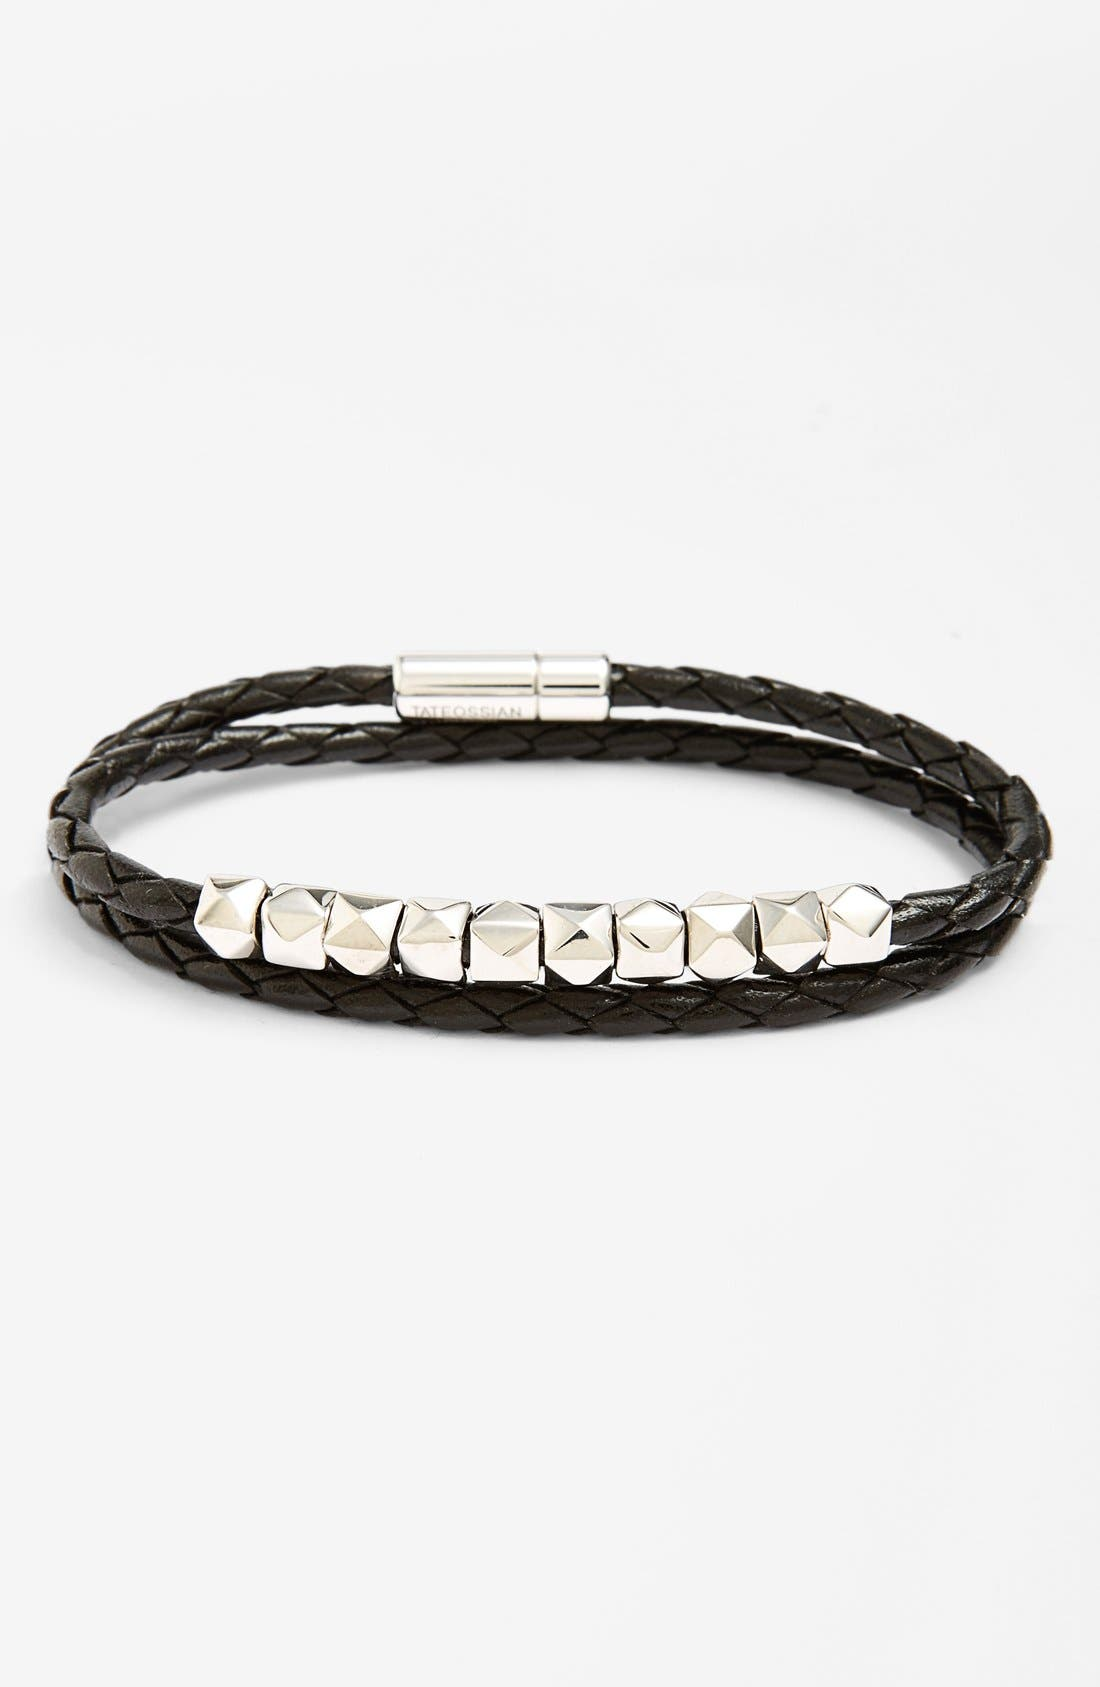 Alternate Image 1 Selected - Tateossian Studded Leather Wrap Bracelet